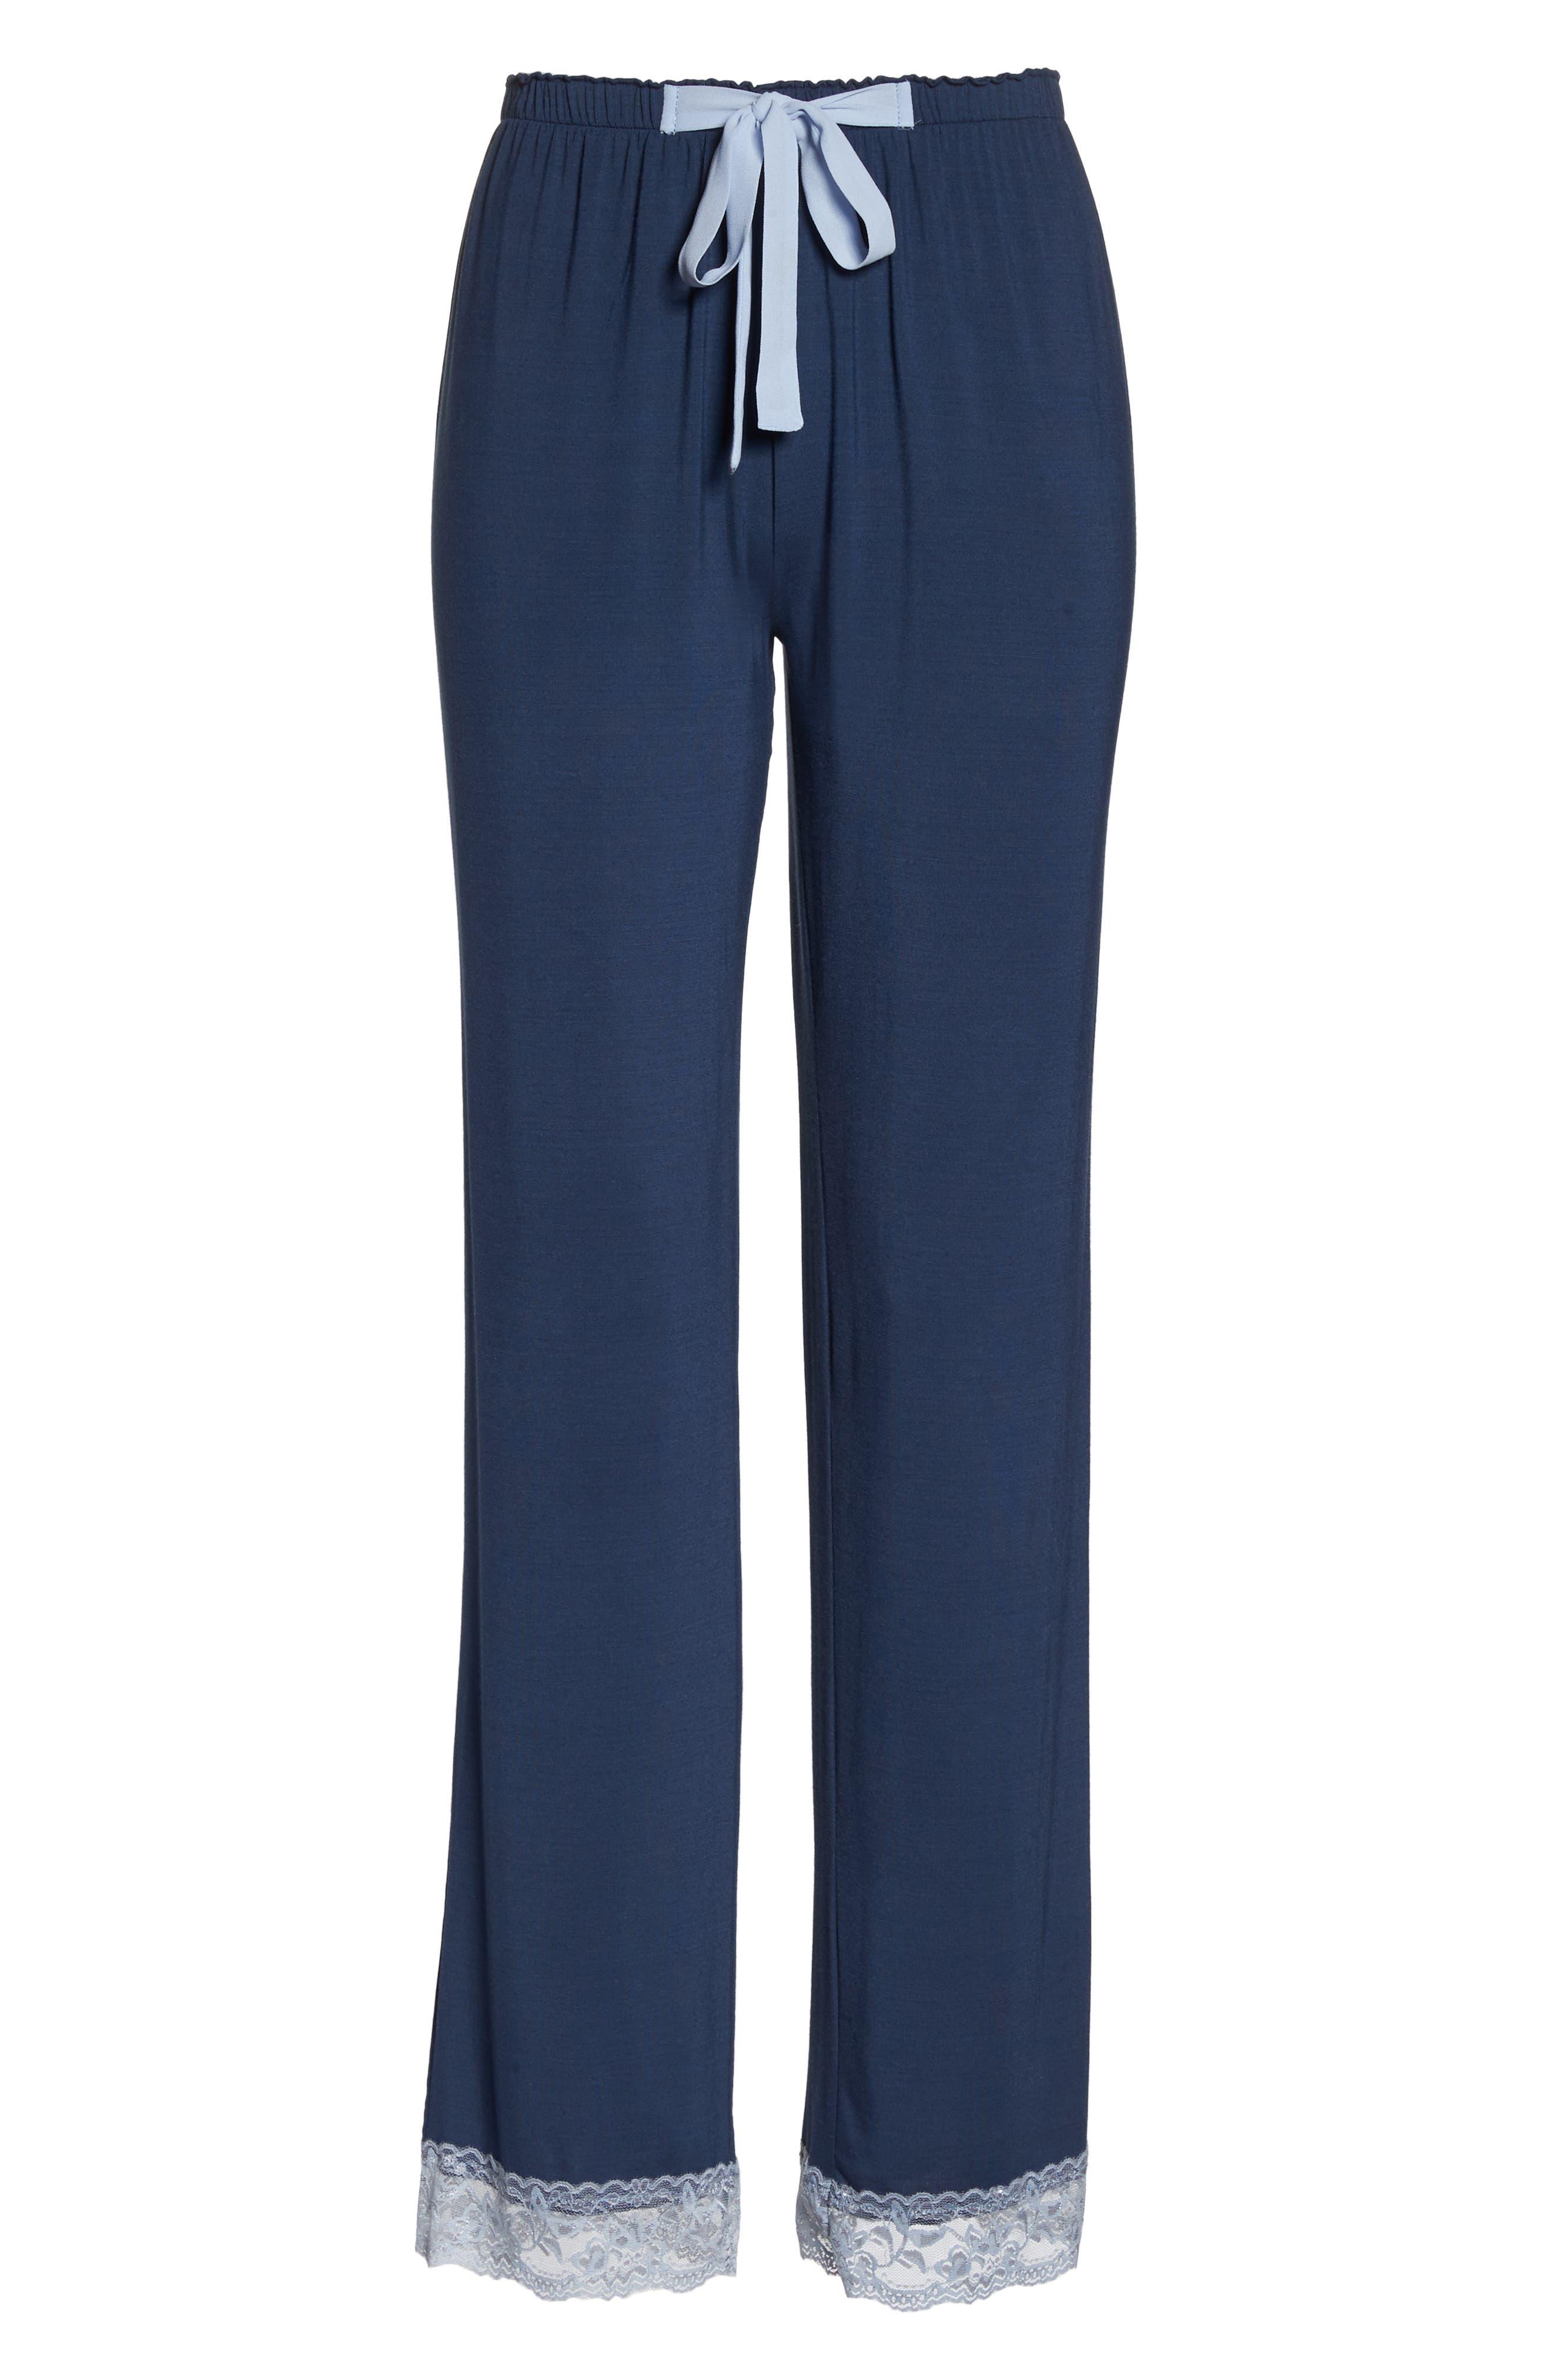 Snuggle Lounge Pants,                             Alternate thumbnail 6, color,                             STEEL BLUE